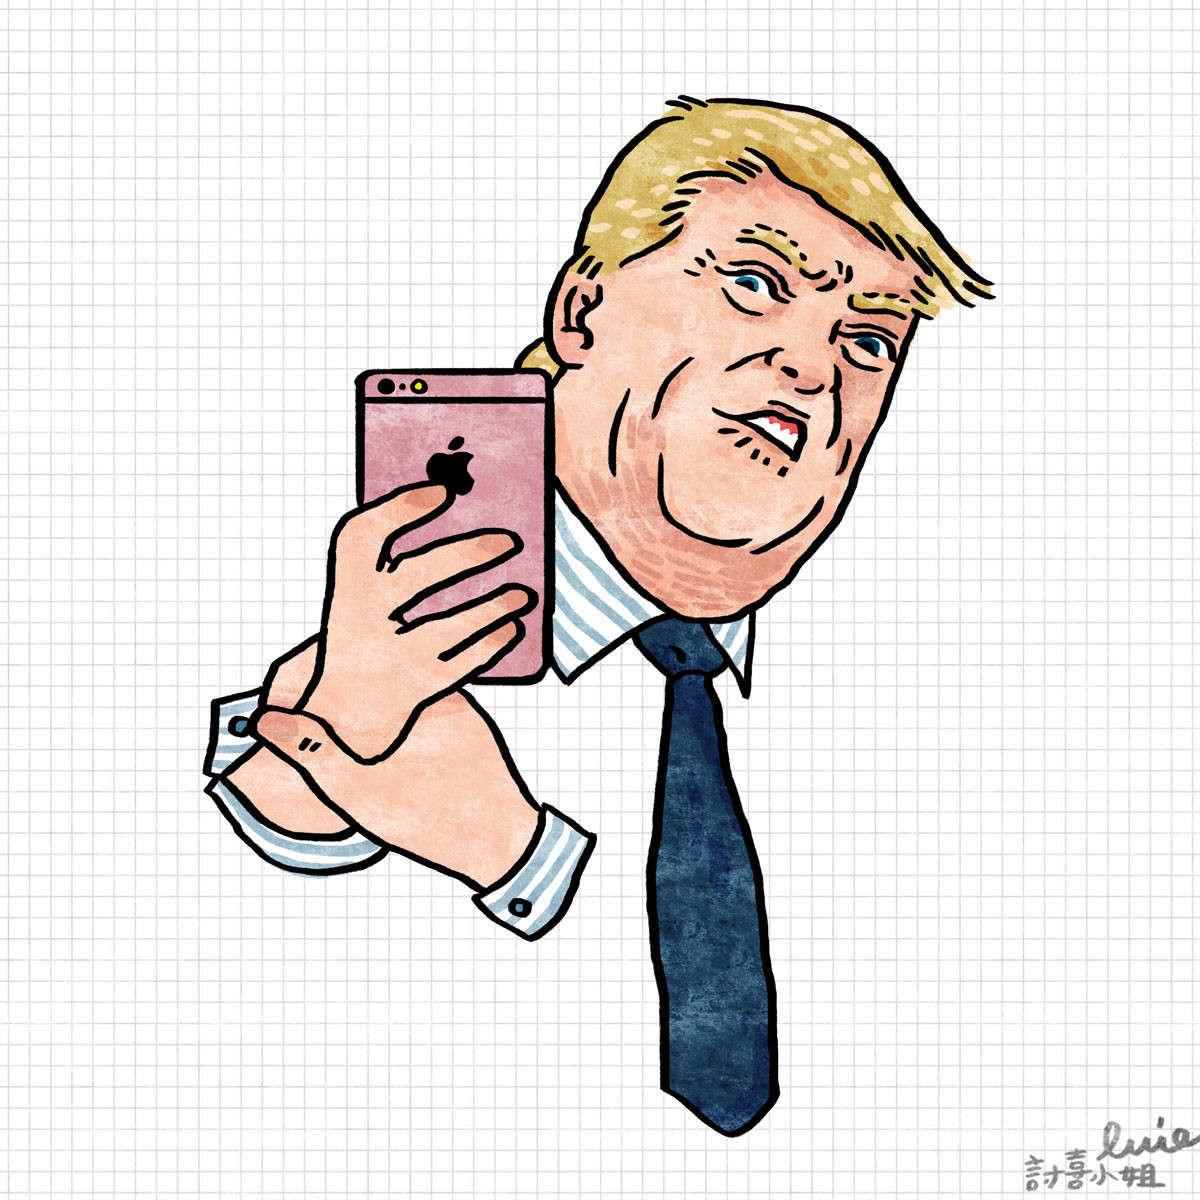 Comics, , News, 瘾科技, Illustration, Cartoon, Text, iPhone, Boycott, Information, cartoon, Cartoon, Illustration, Finger, Thumb, Gesture, Pleased, Art